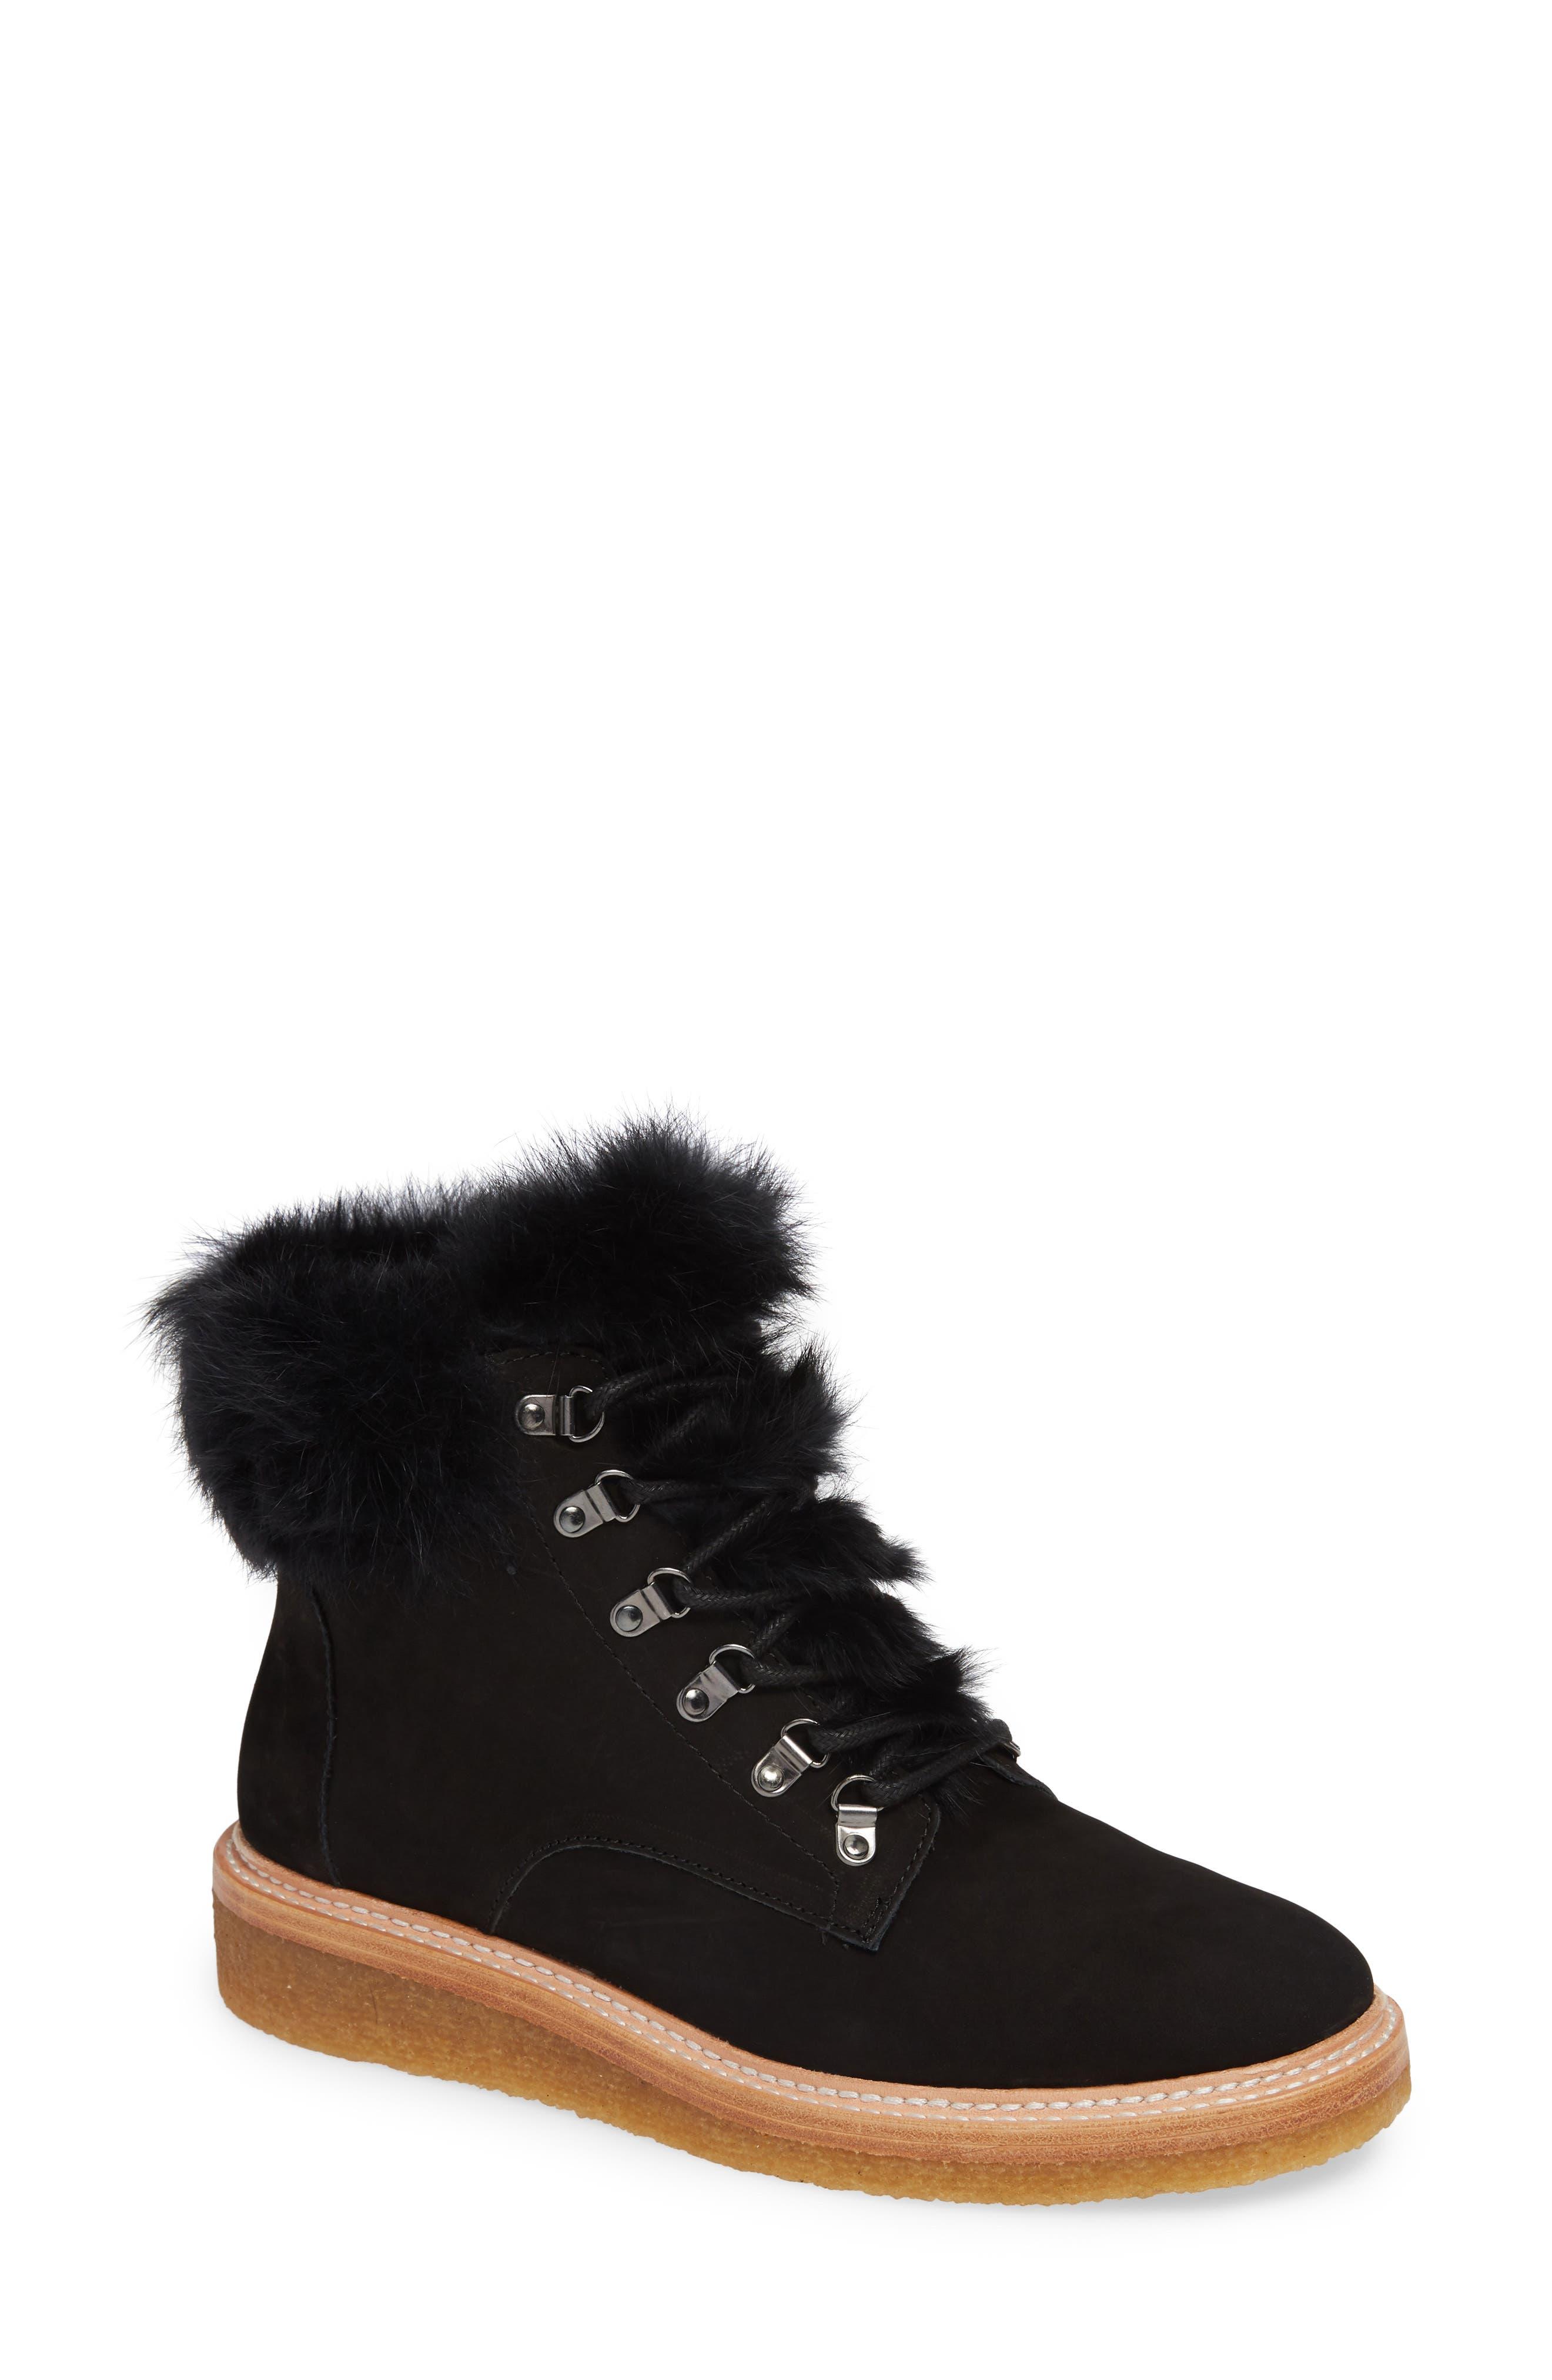 BOTKIER Winter Genuine Rabbit Fur Trim Boot, Main, color, BLACK SUEDE